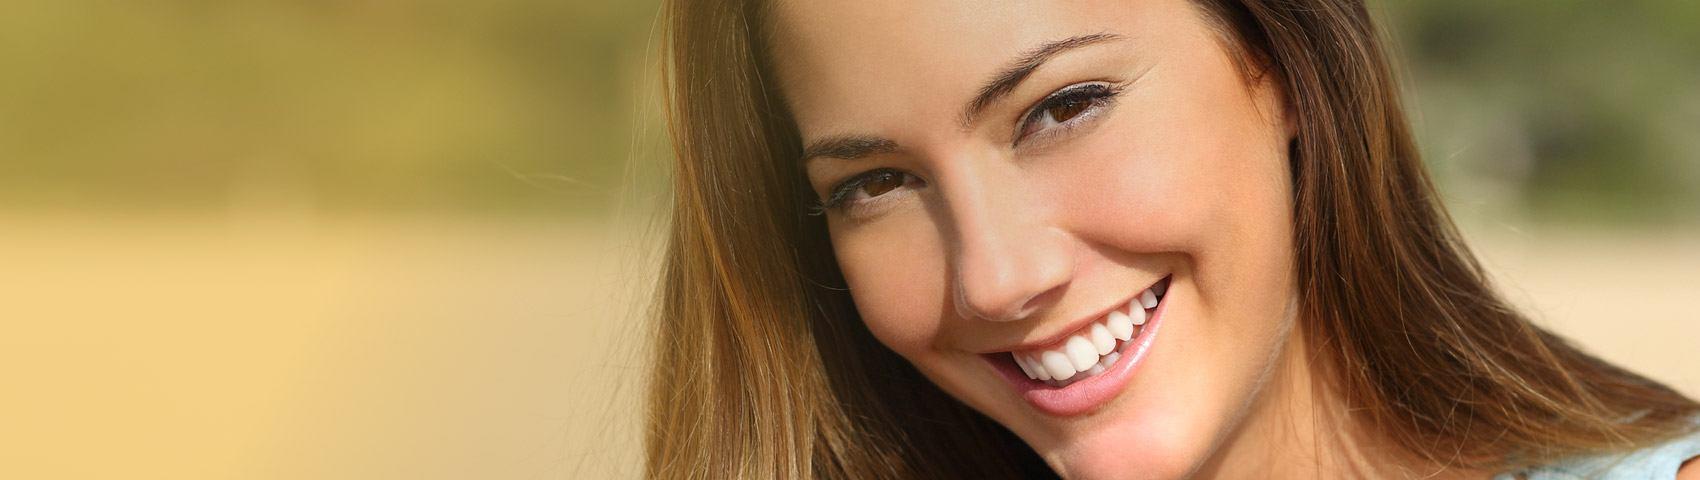 Dental Implants, CA